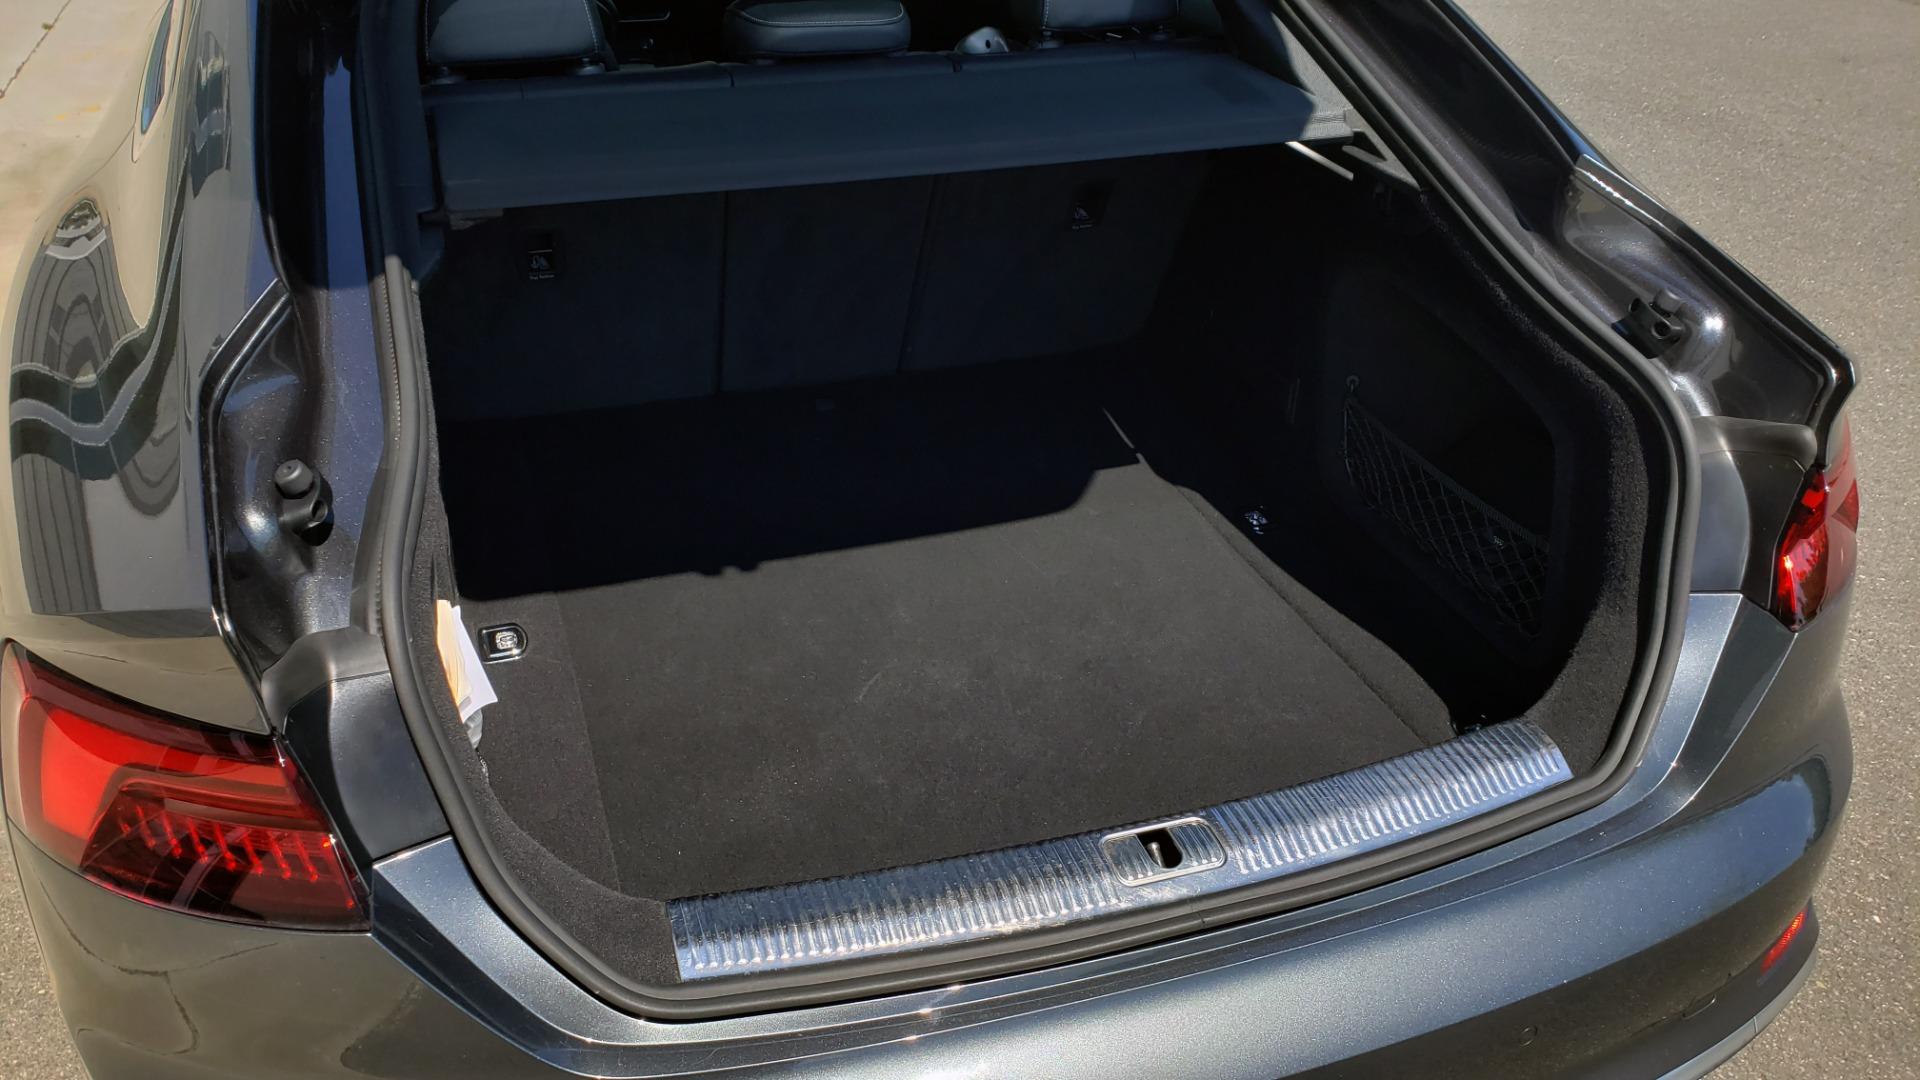 Used 2018 Audi S5 SPORTBACK PRESTIGE S-SPORT / NAV / SUNROOF / HUD / B&O SND / REARVIEW for sale $48,995 at Formula Imports in Charlotte NC 28227 17